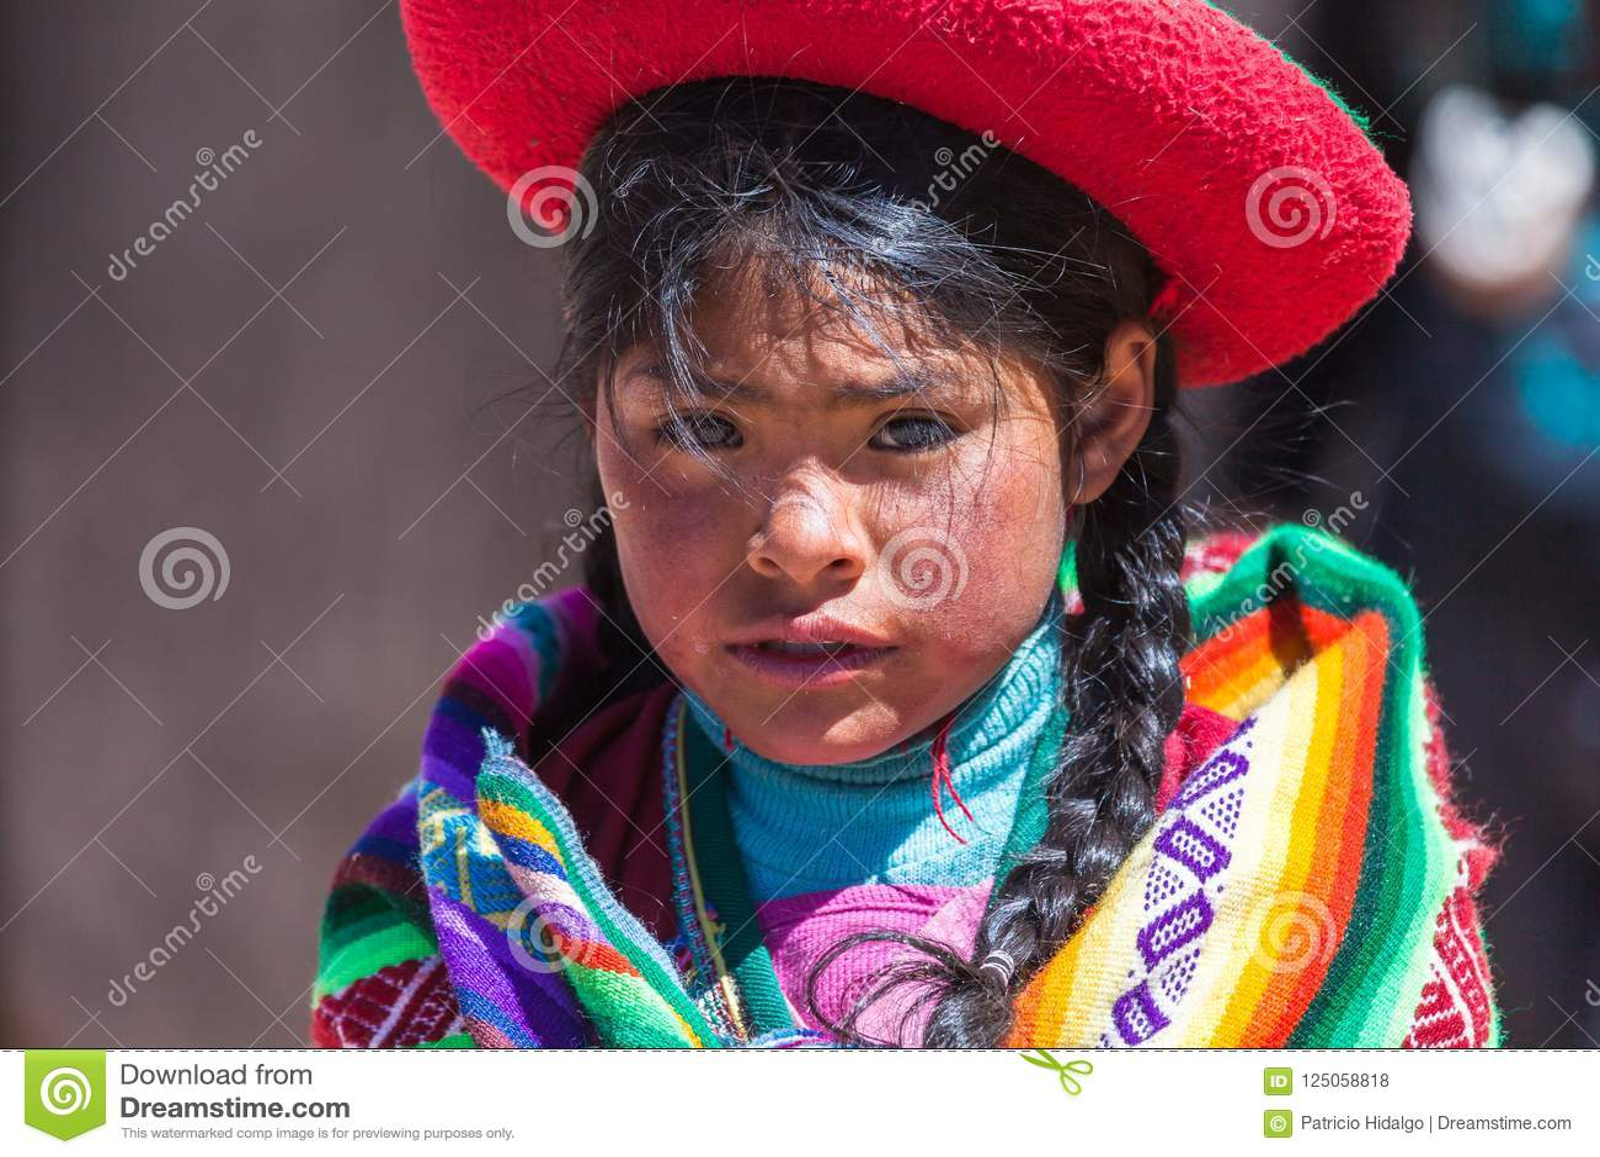 Native of Cusco